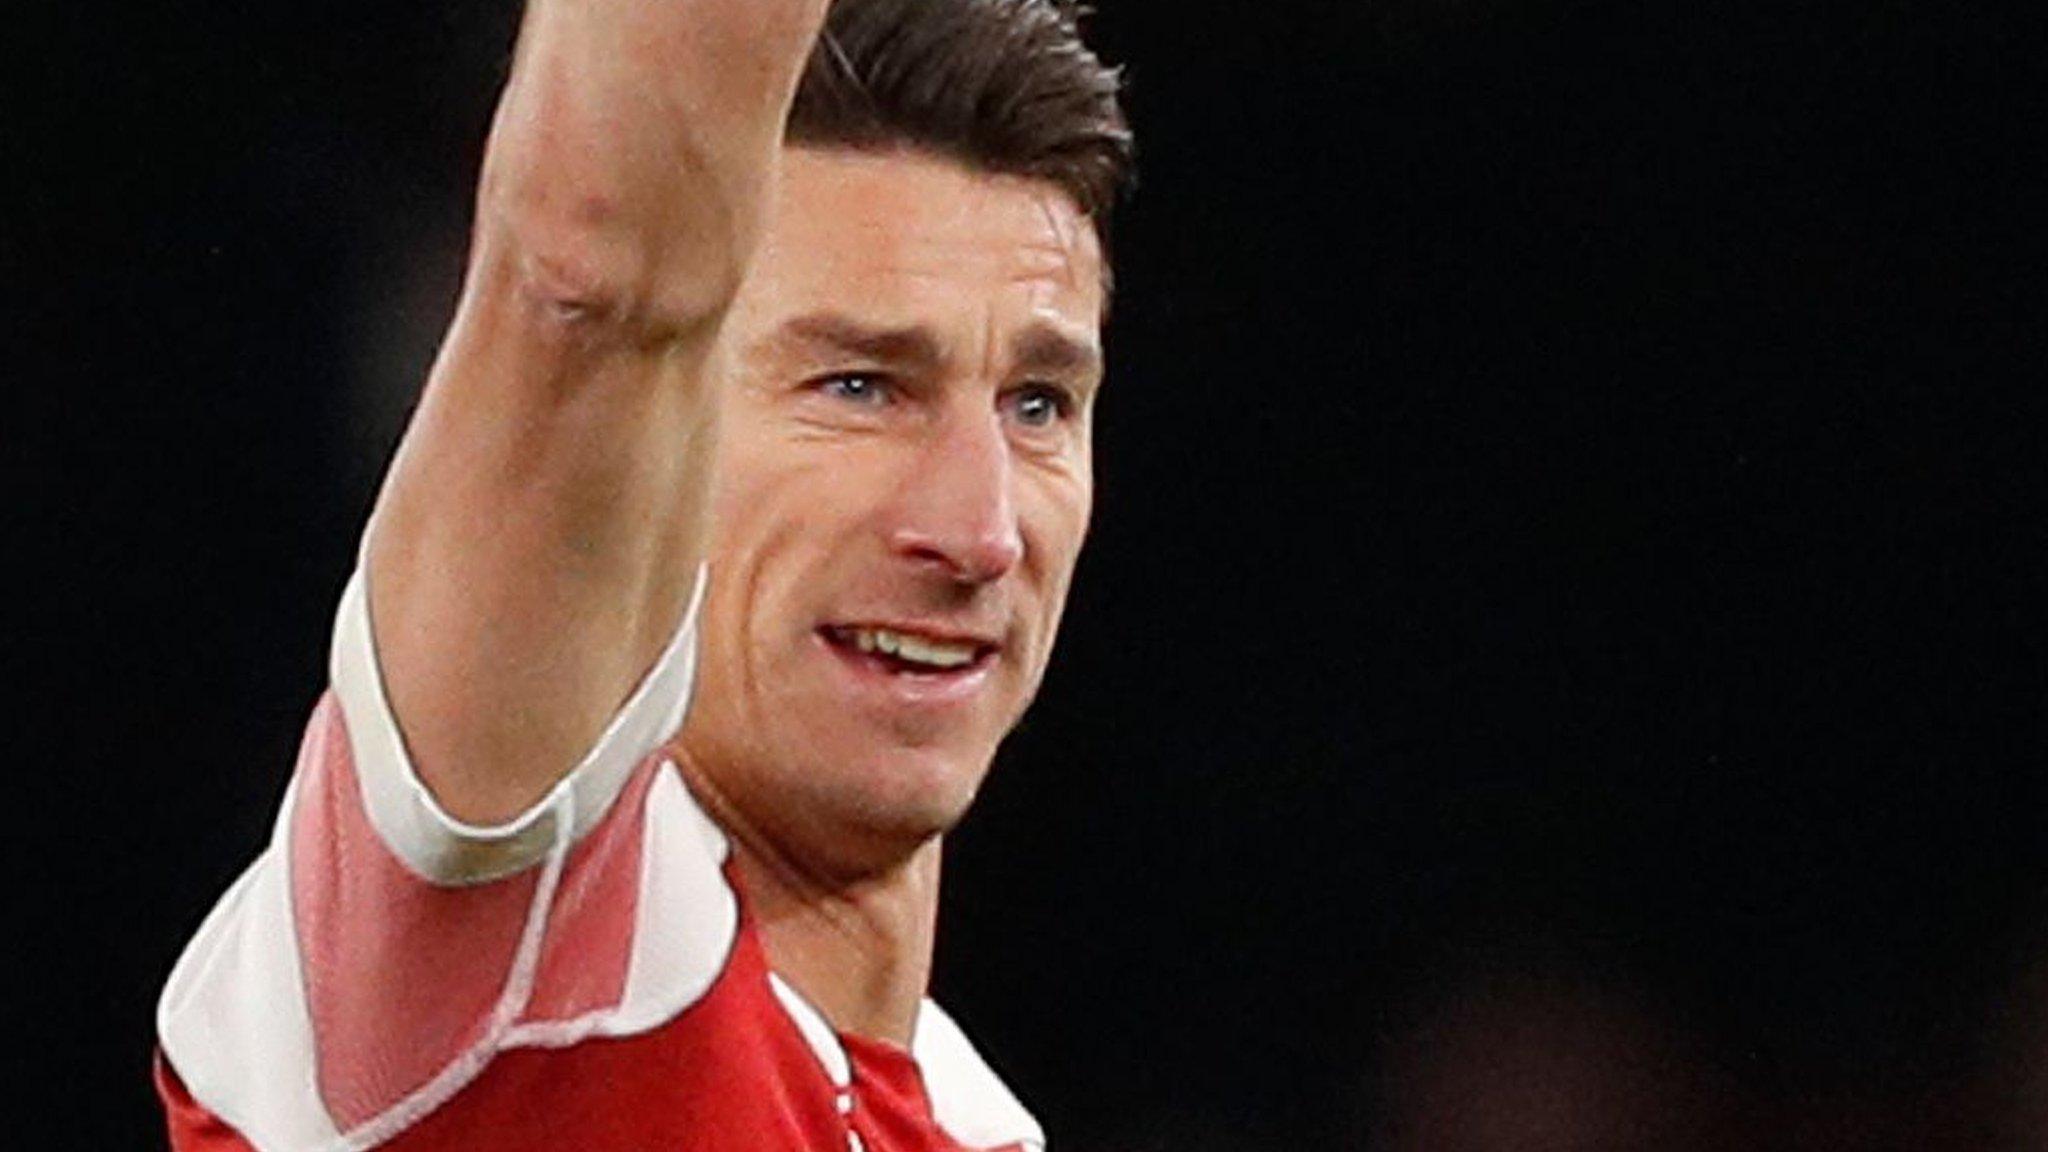 Arsenal: Europa League return for Laurent Koscielny is 'start of new chapter'